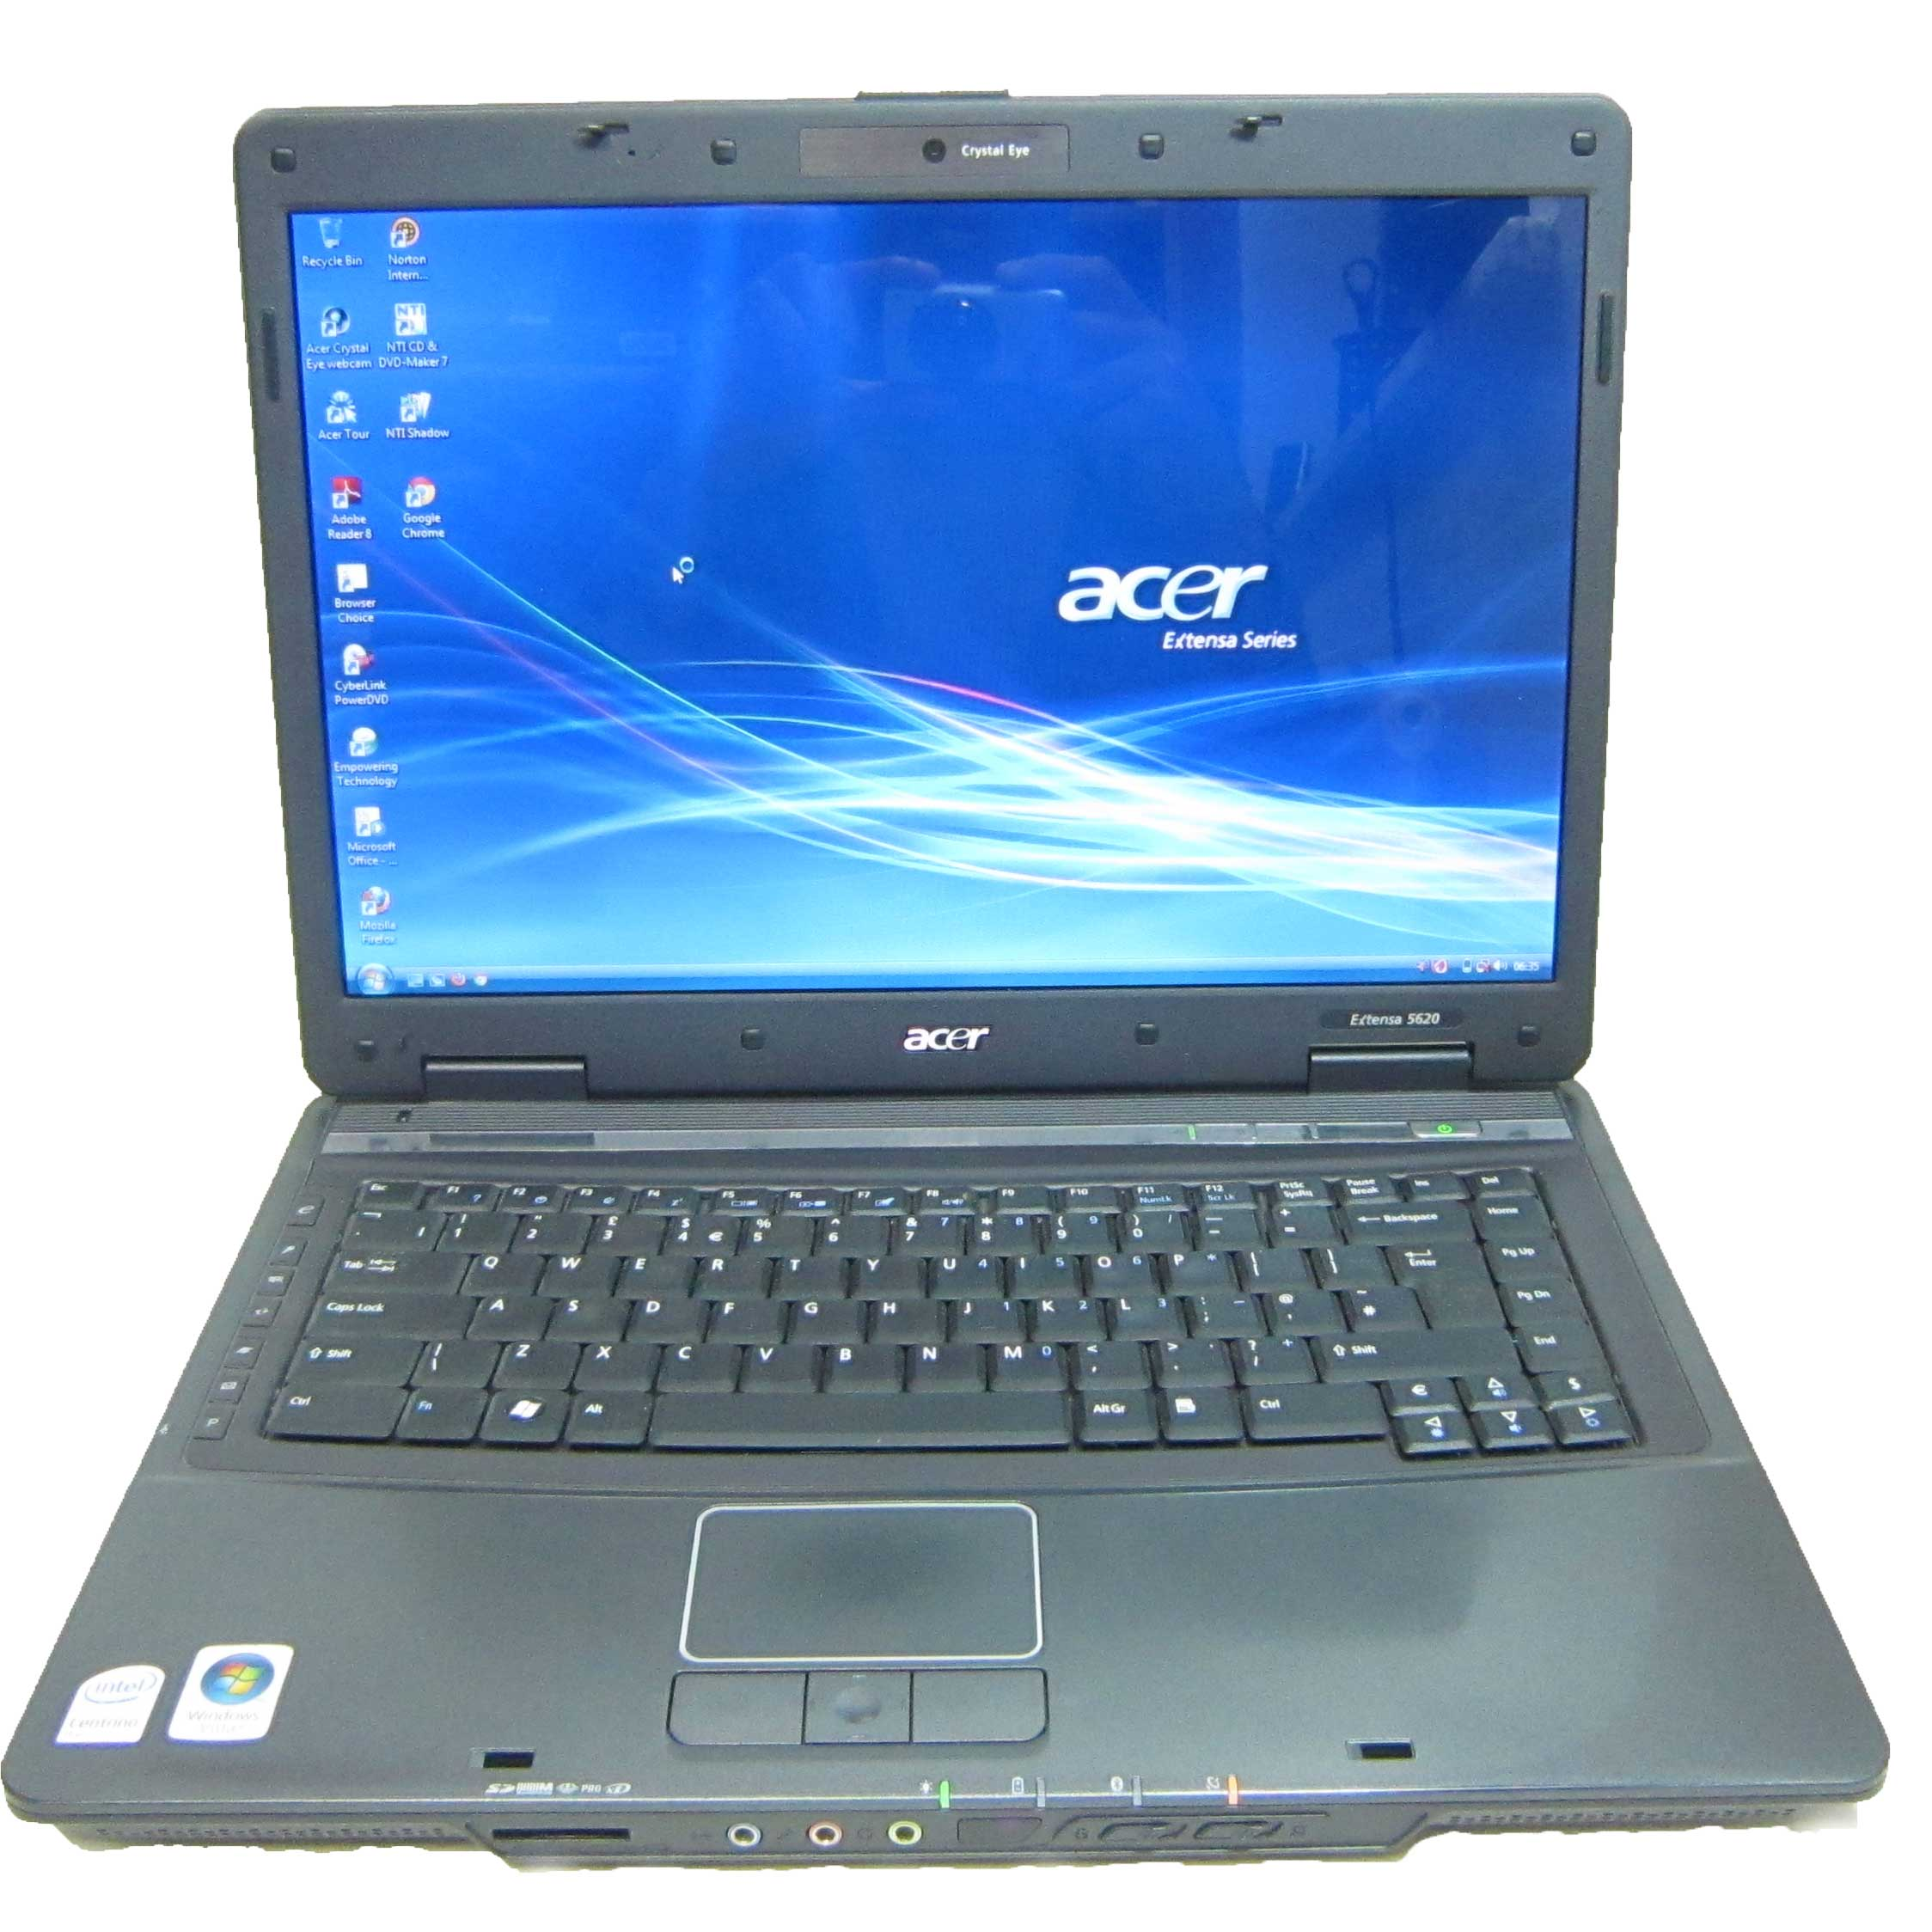 Acer Extensa 5620 160gb 2gb Intel Core 2 Duo Webcam 15.4quot; Laptop